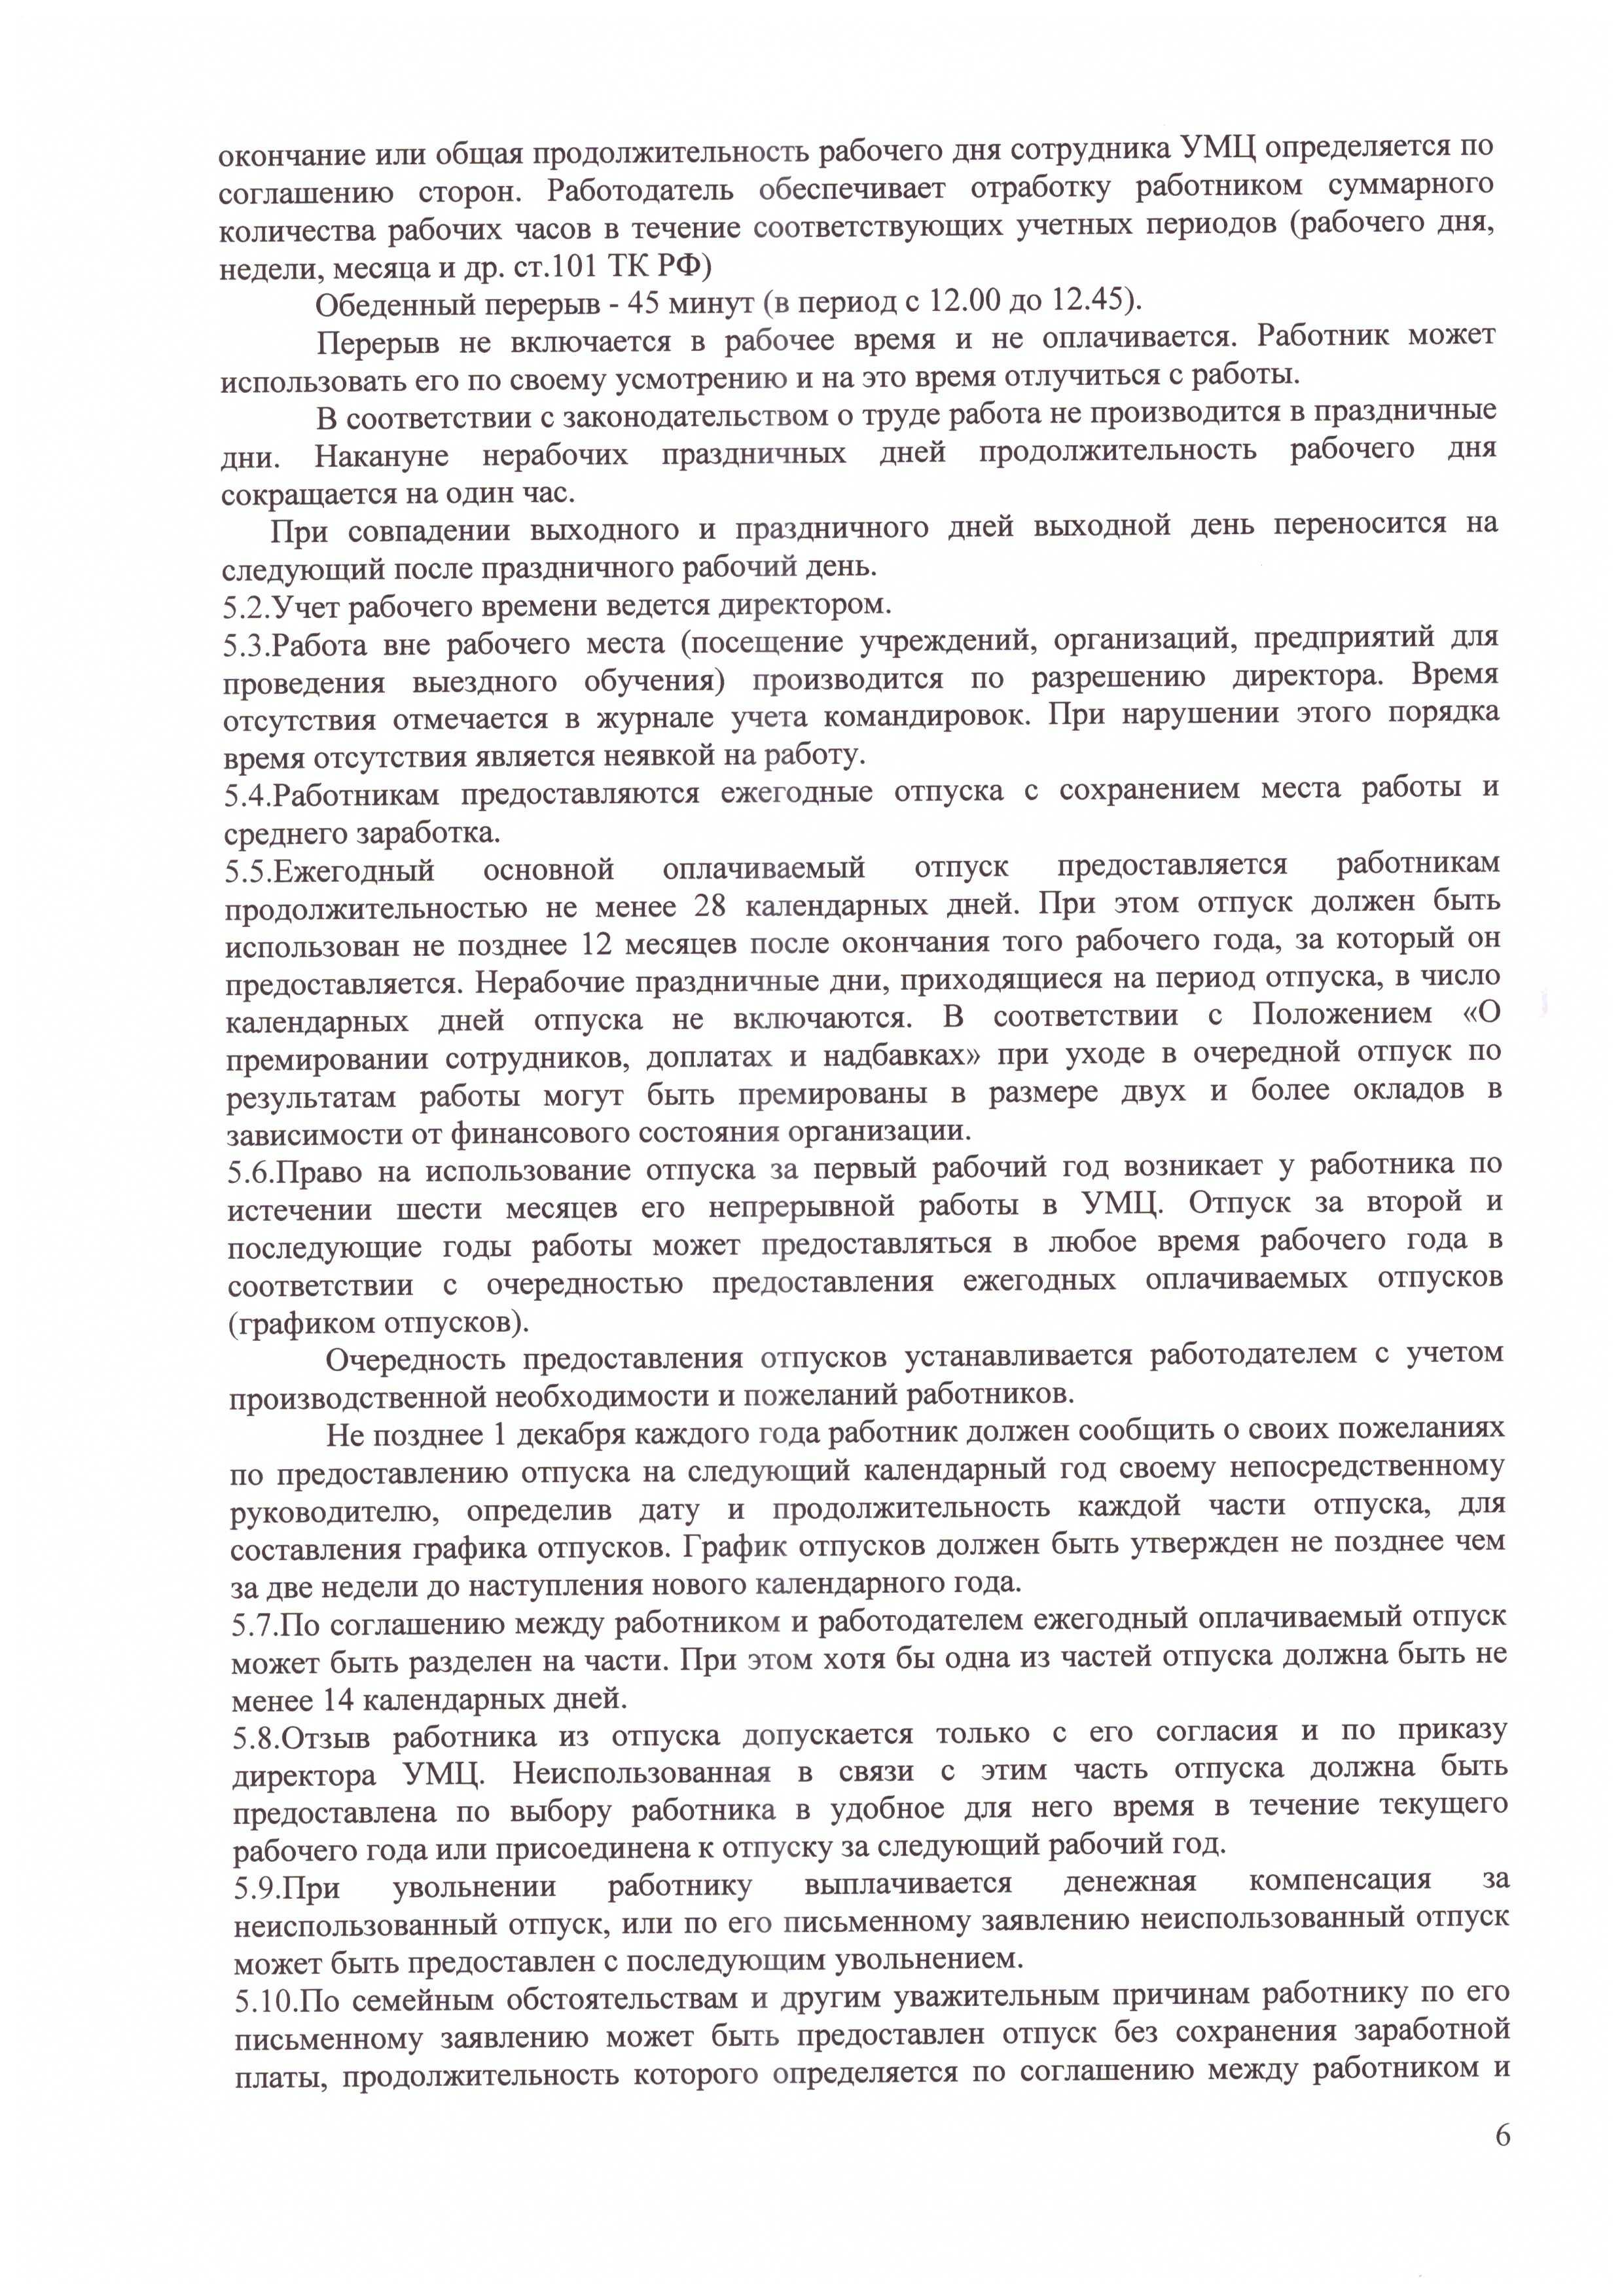 SCAN_правила внутр.распор_Страница_6